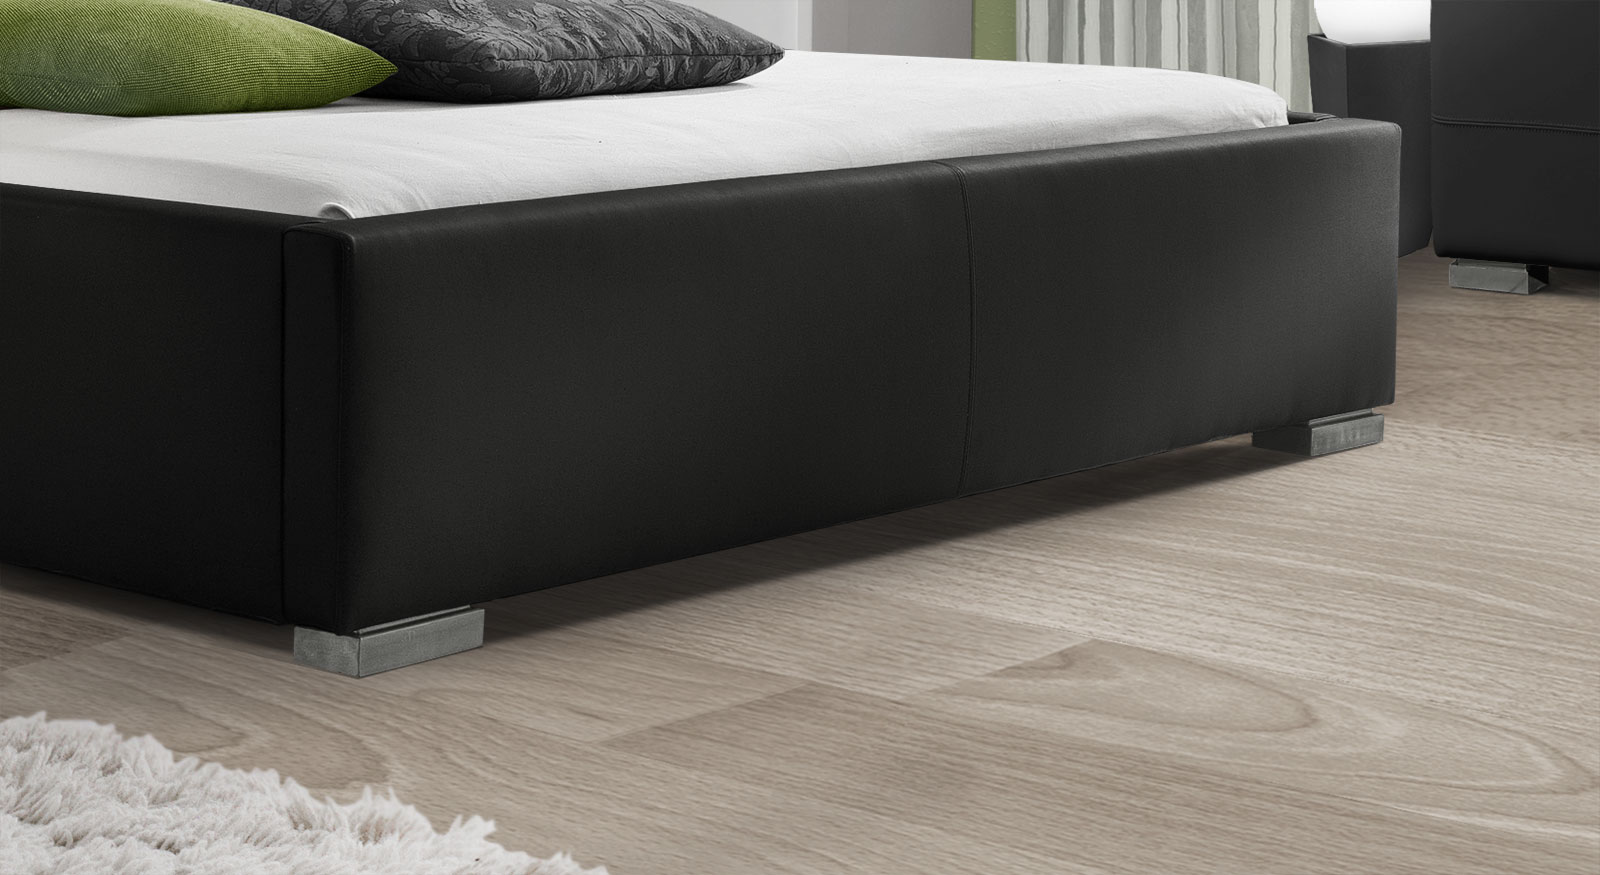 Polsterbett Baskerville Comfort mit niedrigen Metall-Füßen